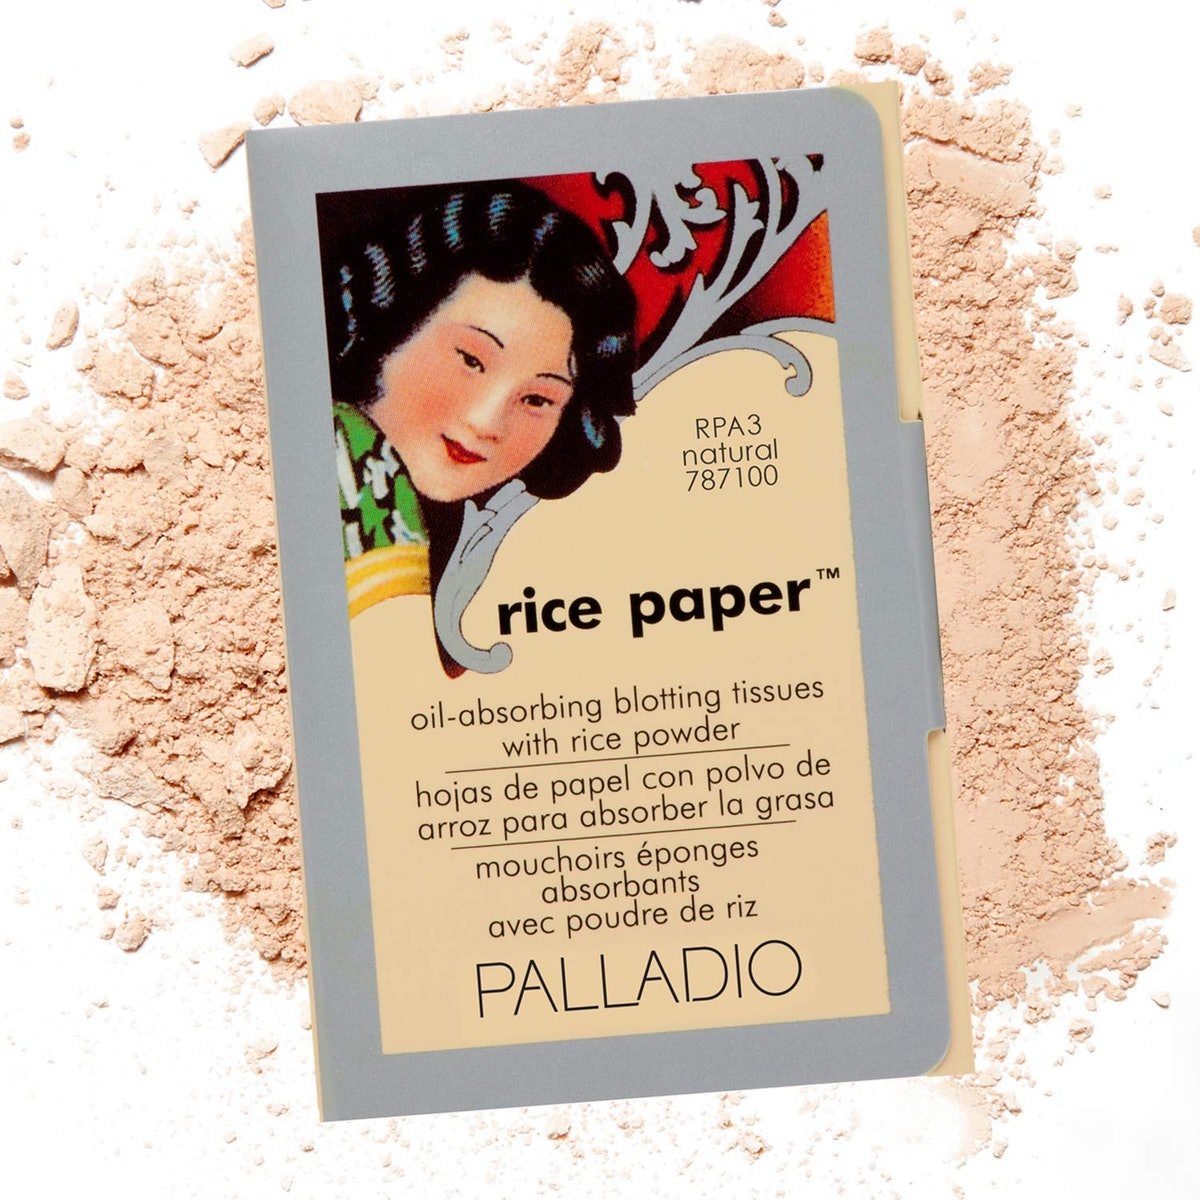 Palladio Rice Paper Blotting Tissues